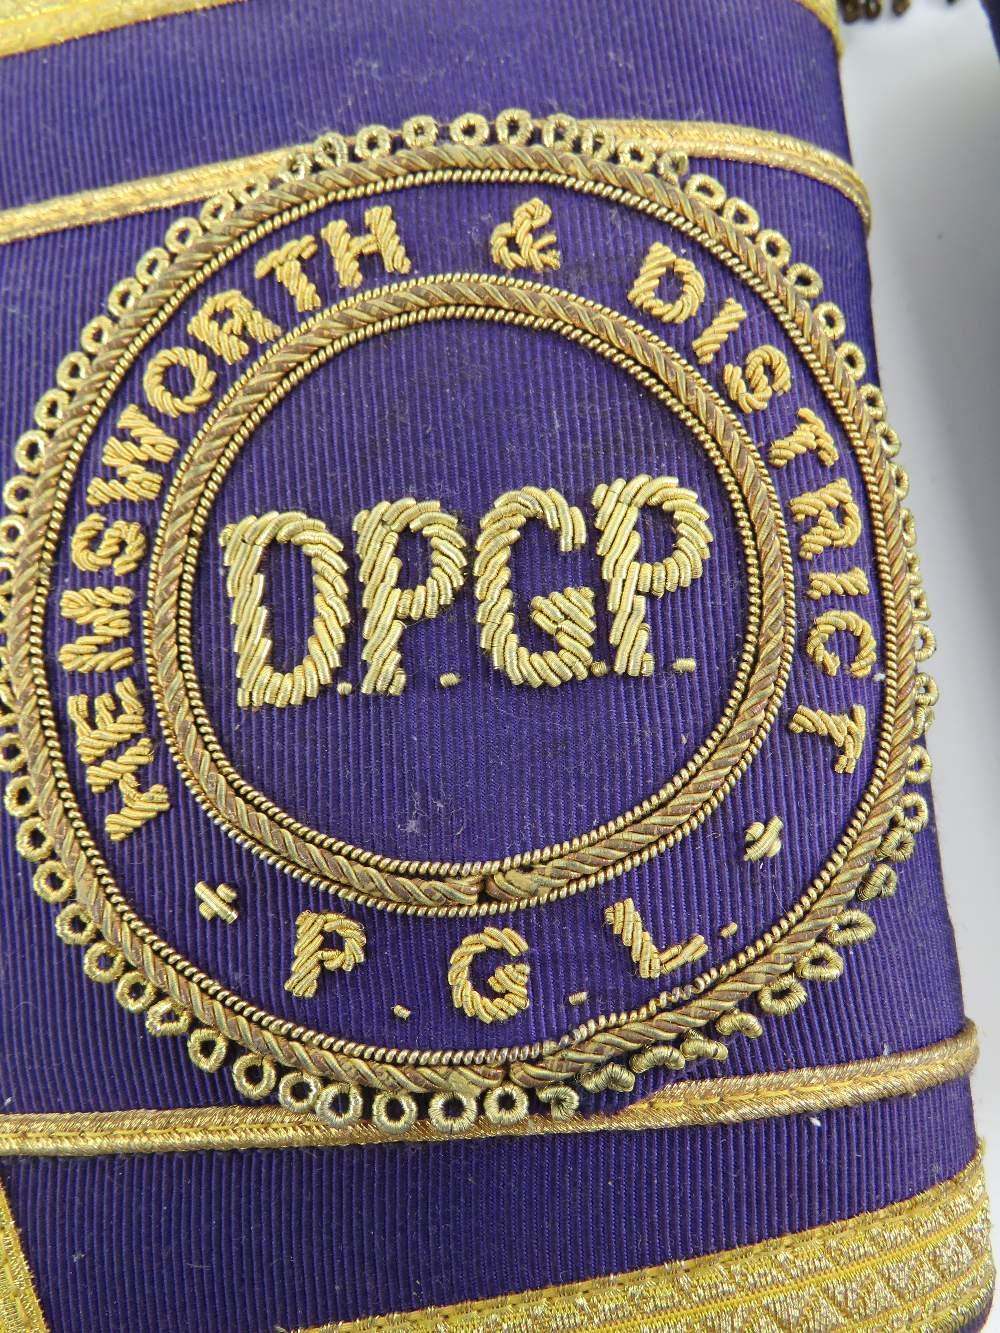 Lot 1 - The Royal Antediluvian Order of Buffaloes (RAOB); a Hemsworth & District PGL D.P.G.